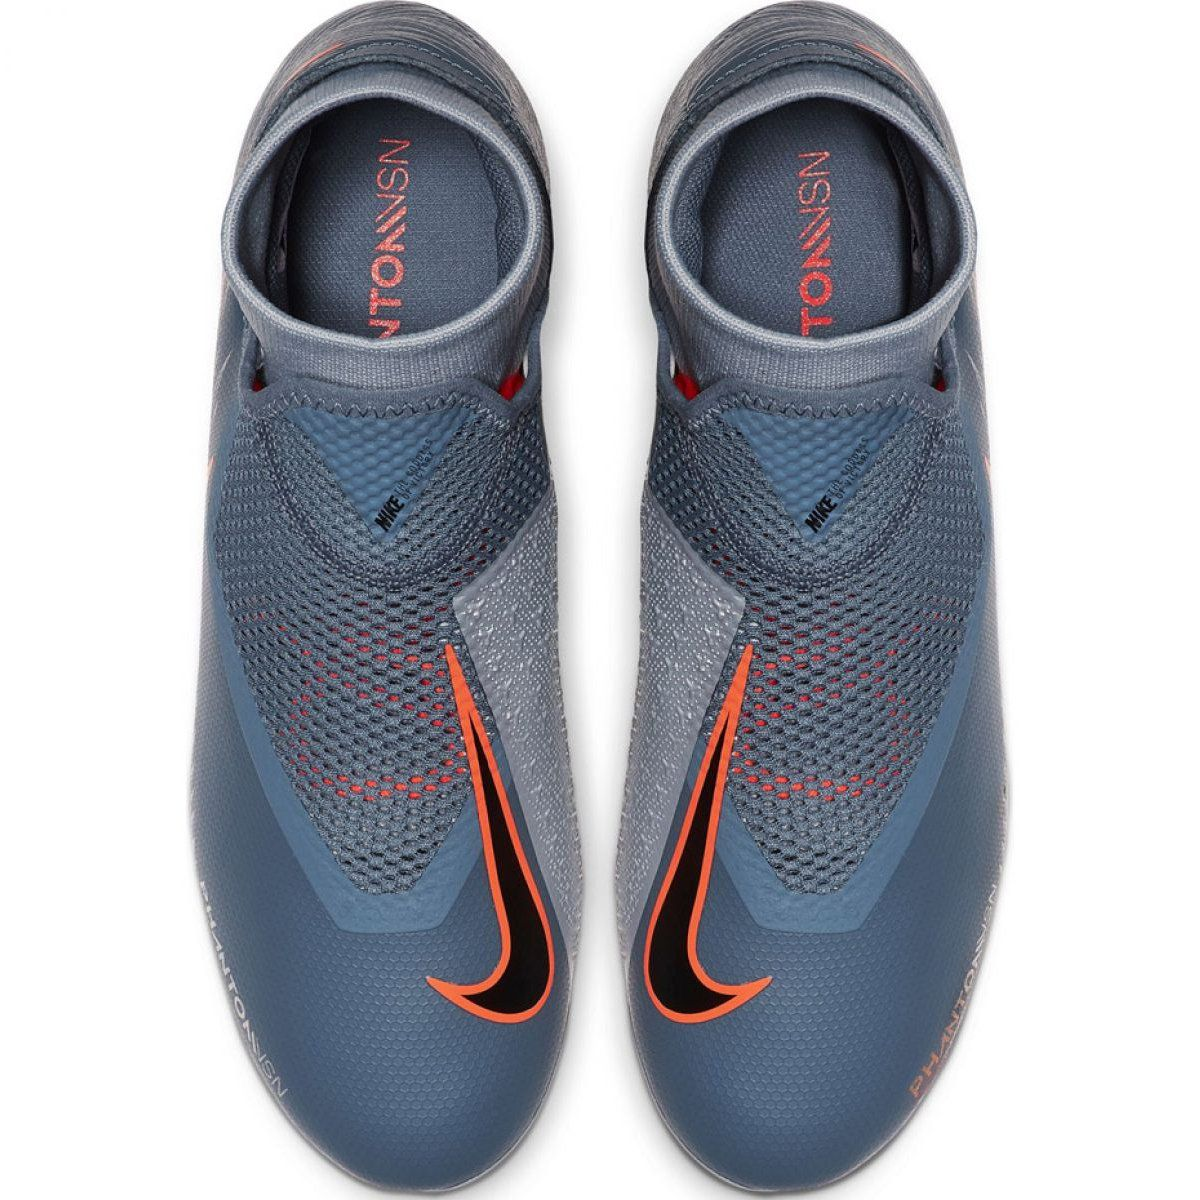 Buty Pilkarskie Nike Phantom Vsn Academy Df Fg Mg M Ao3258 408 Wielokolorowe Szare Football Shoes Nike Football Boots